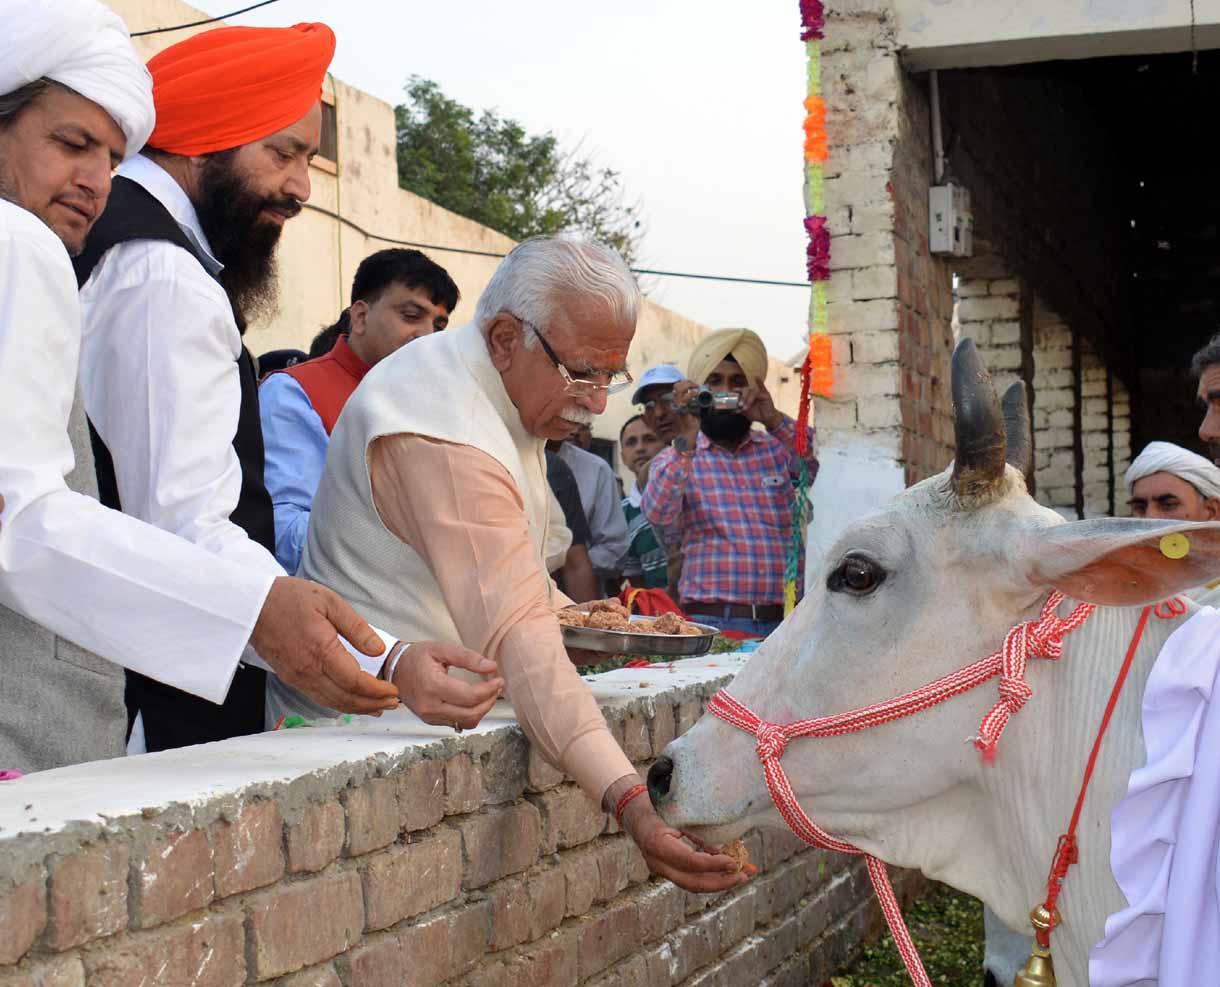 Haryana Chief Minister Mr. Manohar Lal feeding a cow at Shri Krishna Gopal Gaushala, Jundla, Karnal on November 19, 2015. Chief Parliamentary Secretary Mr. Bakhshish Singh Virk is also seen in the picture. Haryana Chief Minister Mr. Manohar Lal laying the foundation stone of Gau Seva Sadan at Shri Krishna Gopal Gaushala, Jundla, Karnal on November 19, 2015. Chief Parliamentary Secretary Mr. Bakhshish Singh Virk is also seen in the picture.